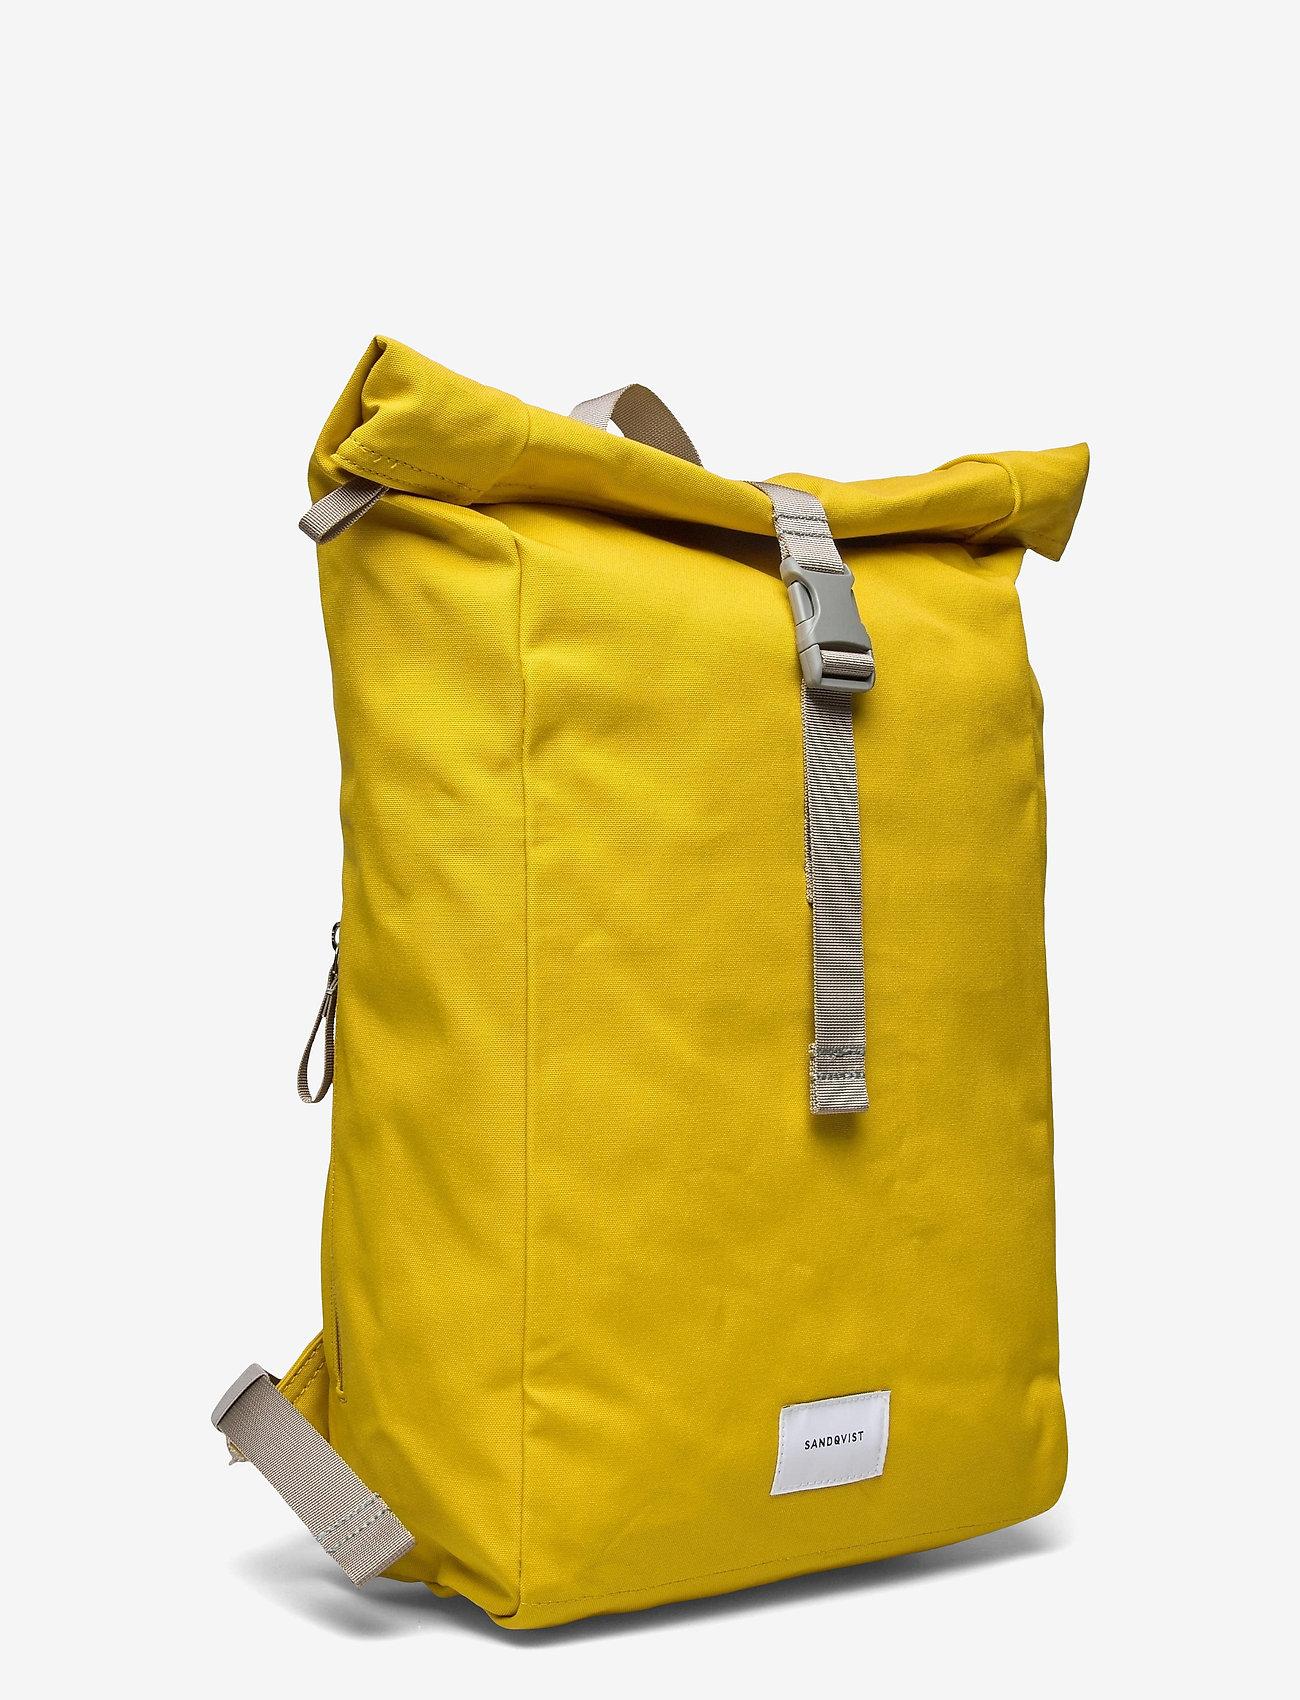 SANDQVIST - KAJ - bags - yellow with grey webbing - 2